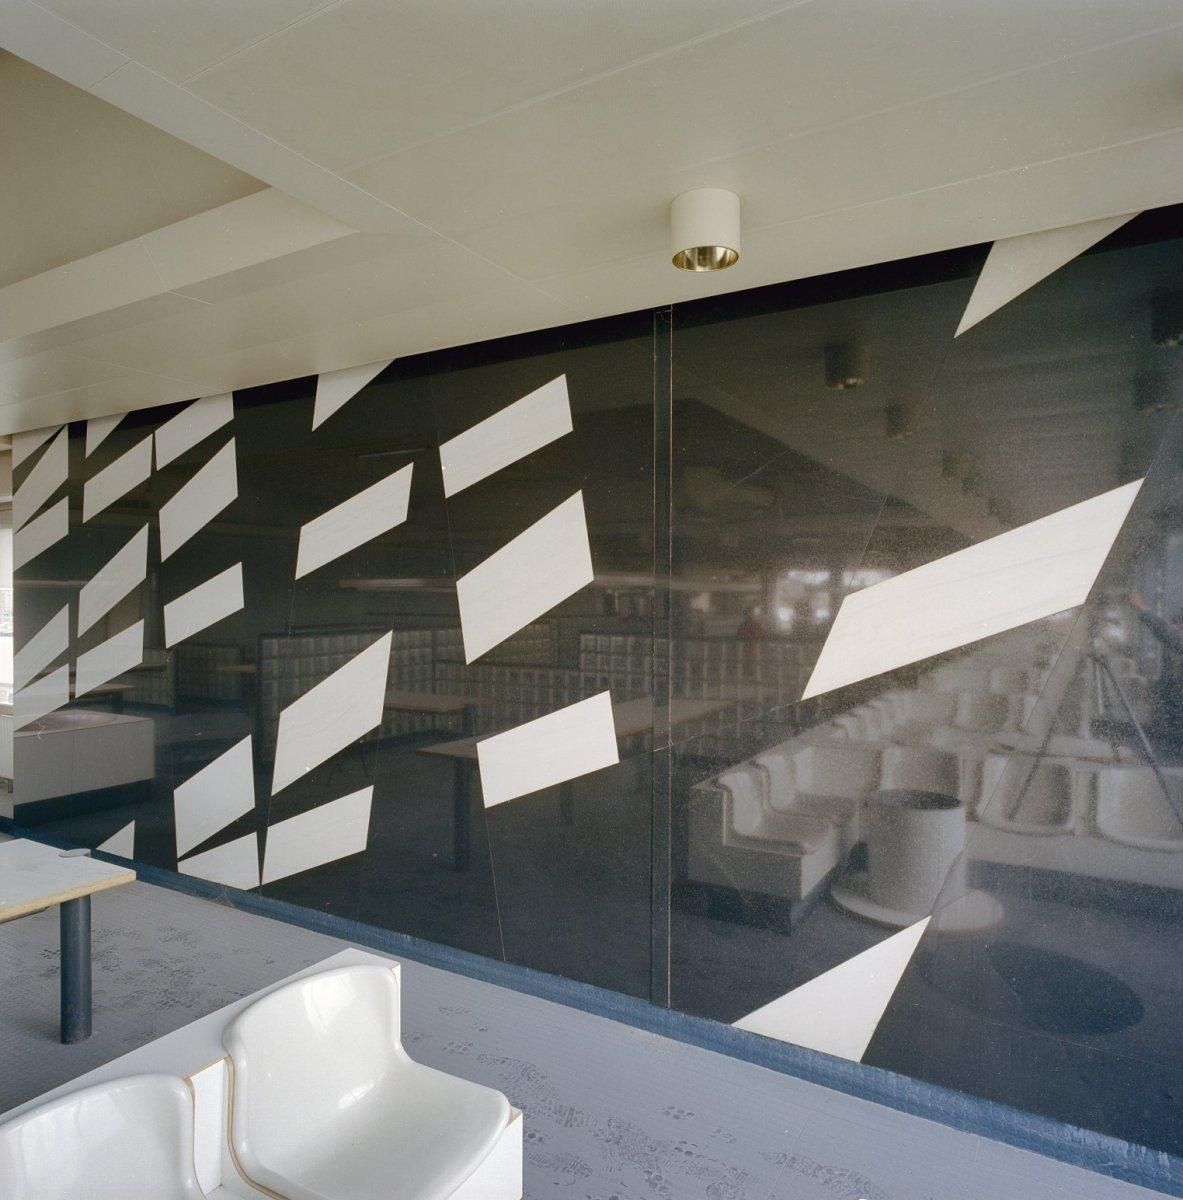 file:interieur, spiegelwand met kunstmotieven - amsterdam - 20330036